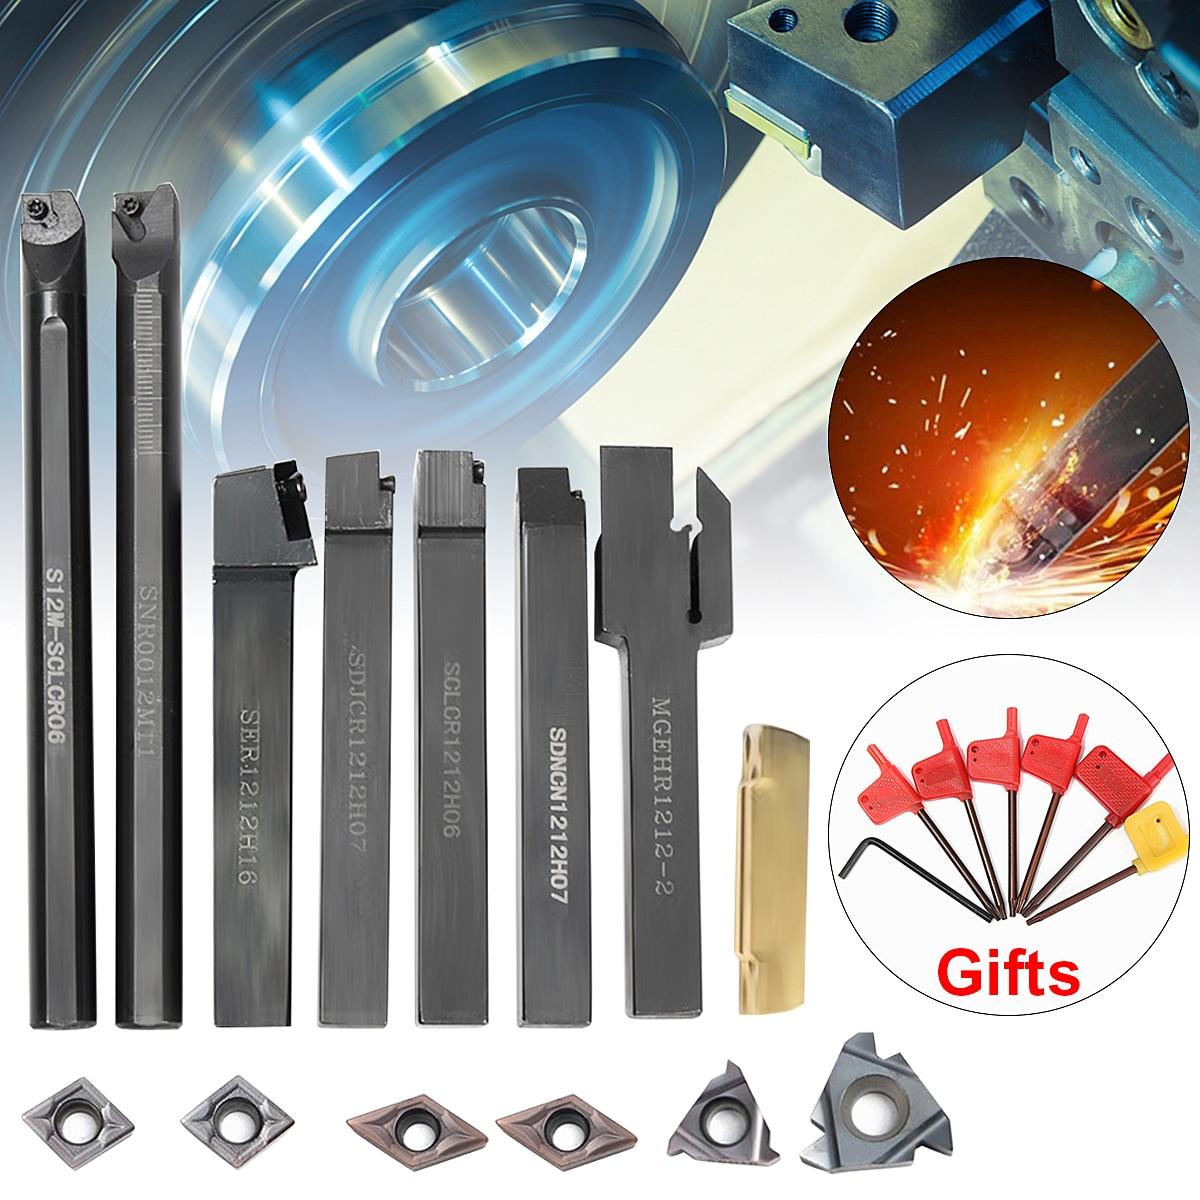 7PCS DCMT CCMT Carbide Insert + 7PCS 12MM Lathe Turning Tool Holder Boring Bar + Wrench For Lathe Turning Tool